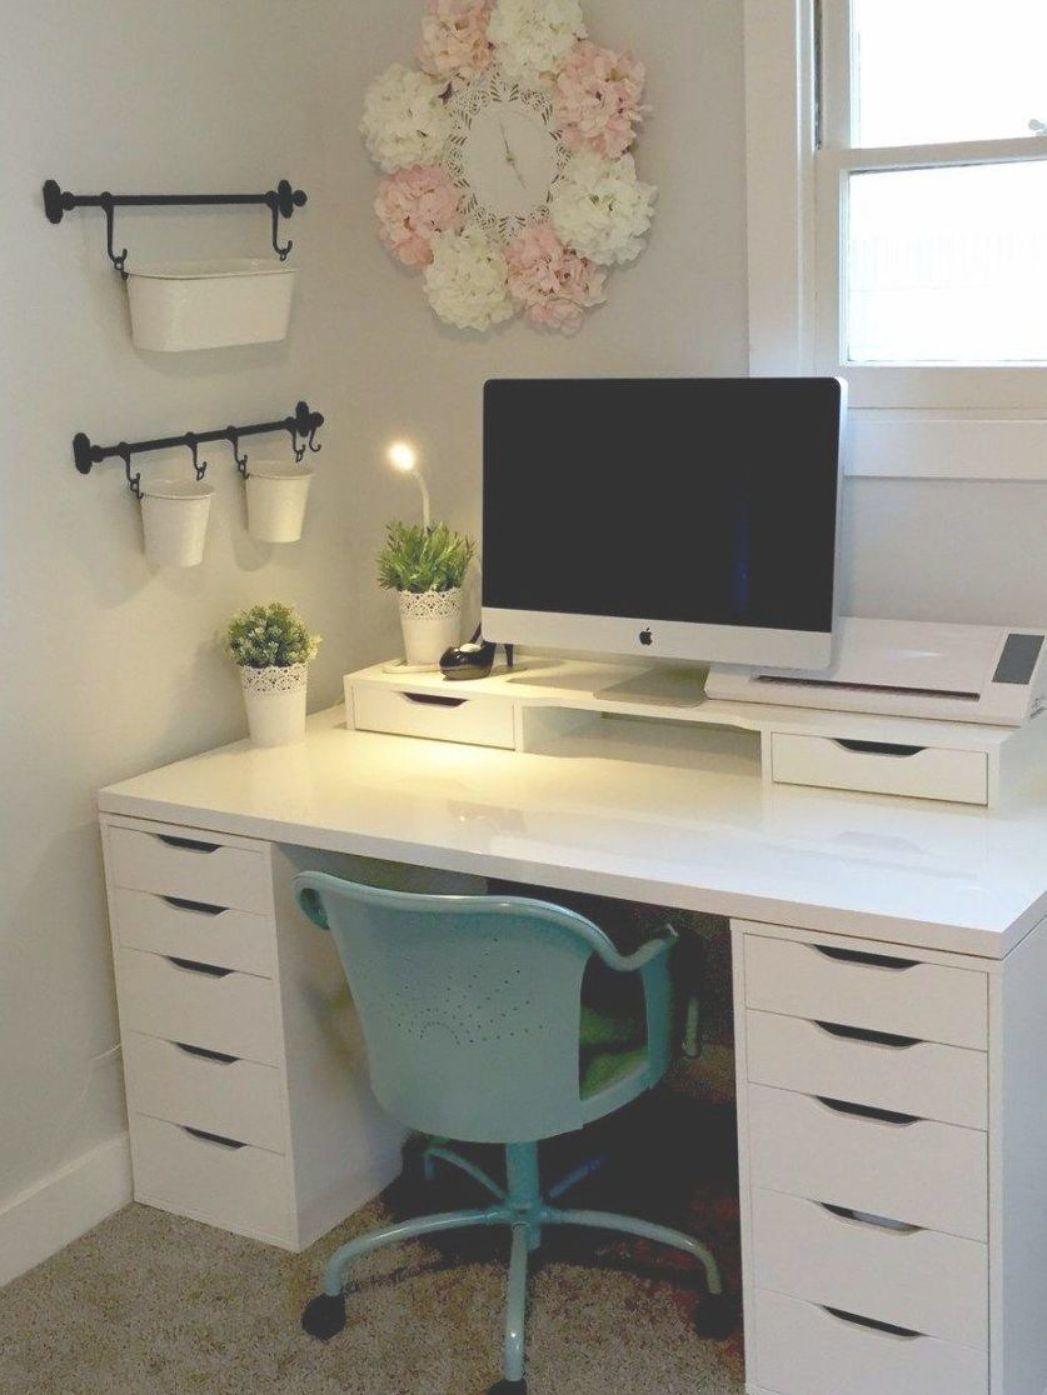 42 Inexpensive Craft Room Ideas From Ikea 48 Craft Room Ikea Alex Linnmon Craft Room 4 In 2020 Small Office Desk Office Desk Decor Ikea Desk